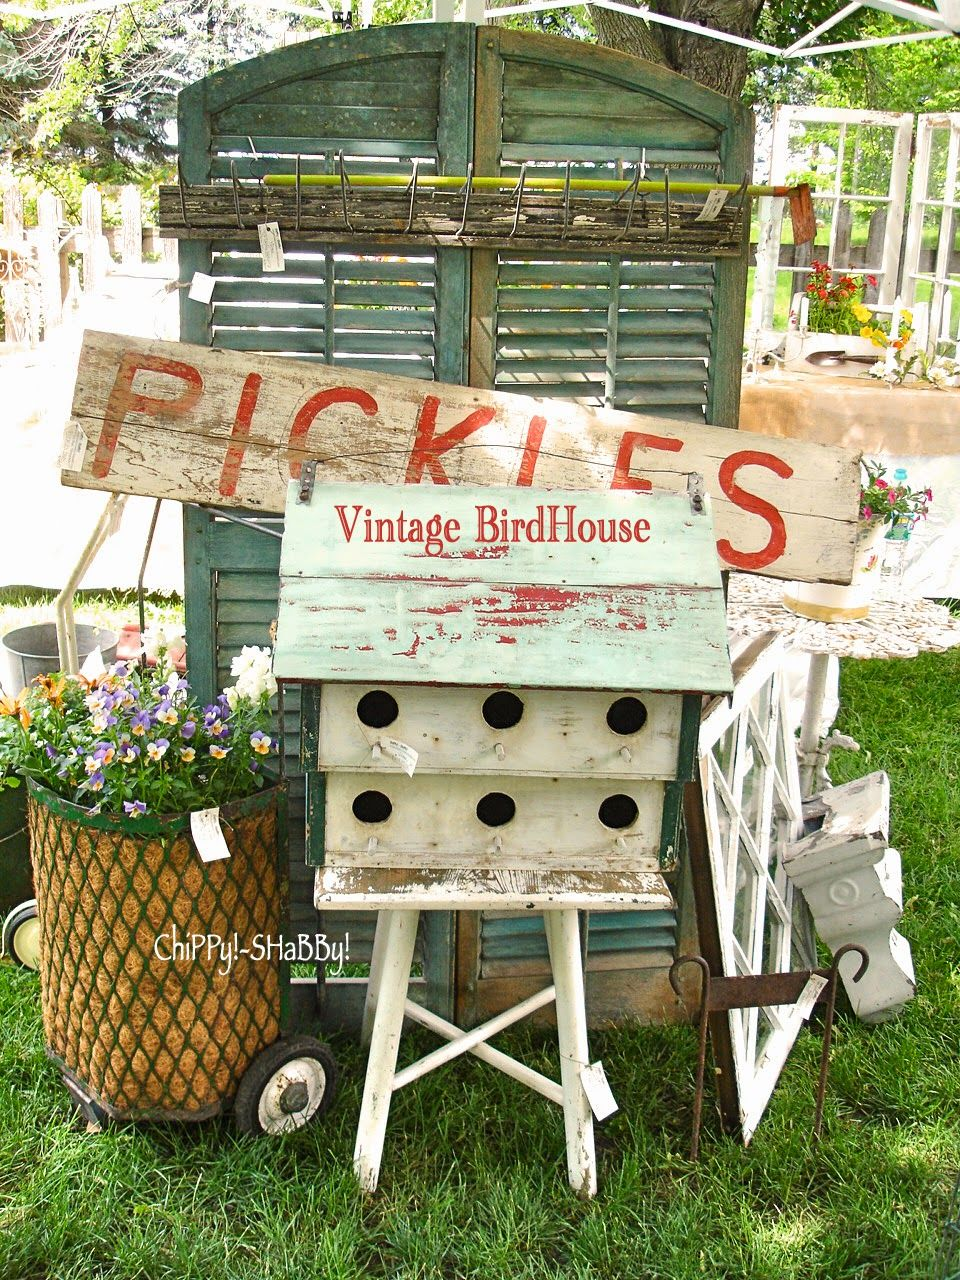 Booth northwind perennial farm antique show muebles y accesorios para mesas de dulces - Accesorios para terrazas ...